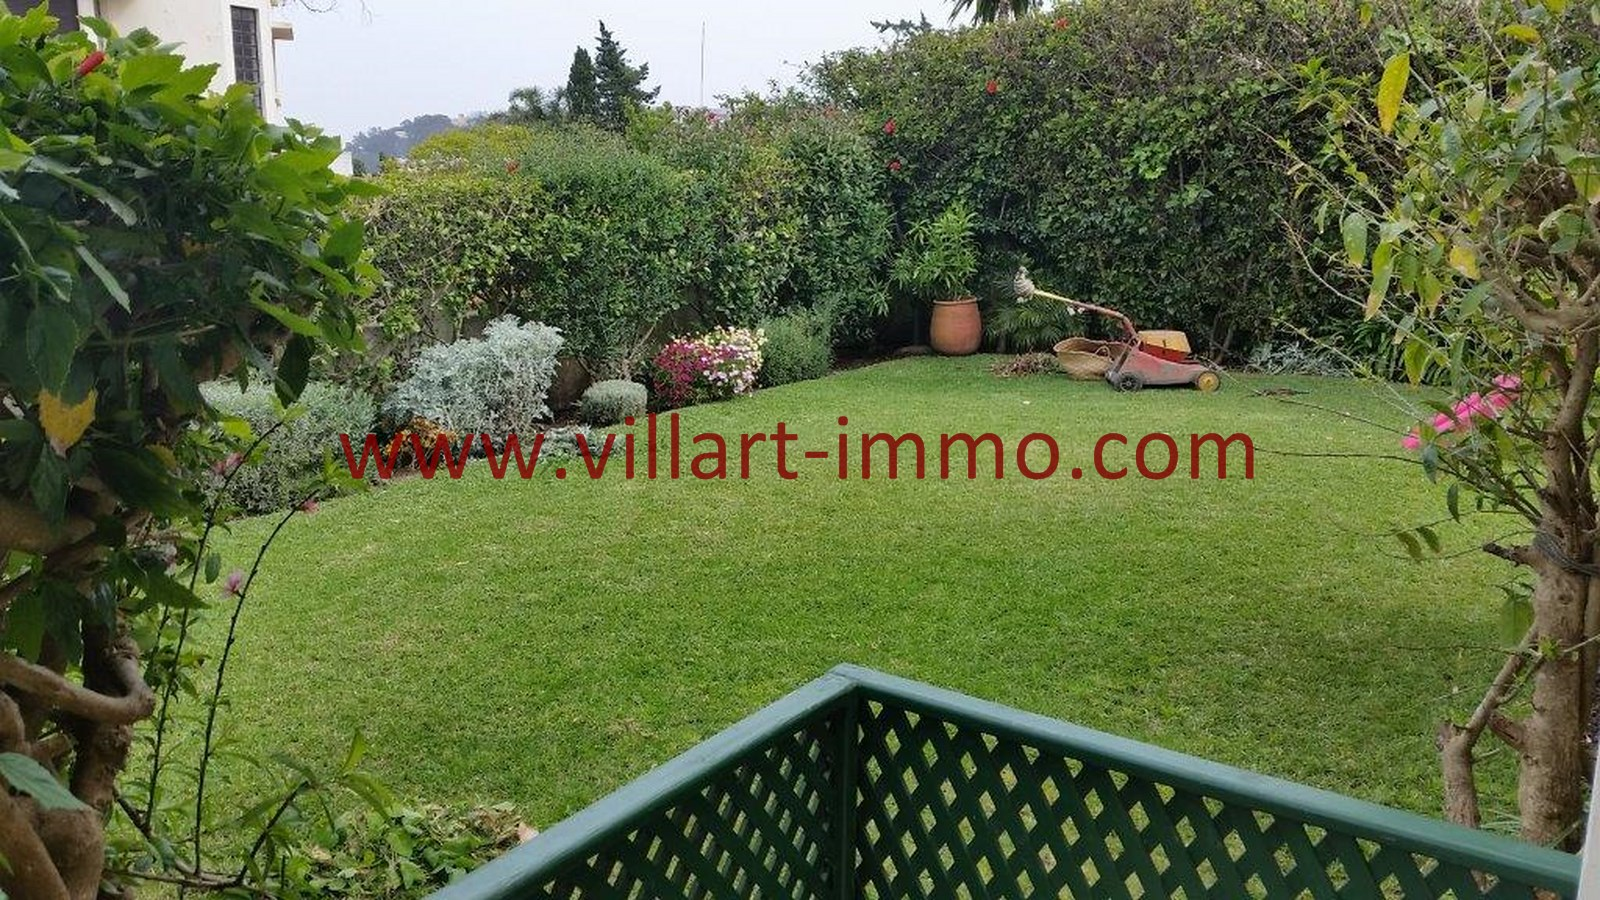 15-a-vendre-tanger-villa-californie-jardin-4-vv459-villart-immo-agence-immobiliere